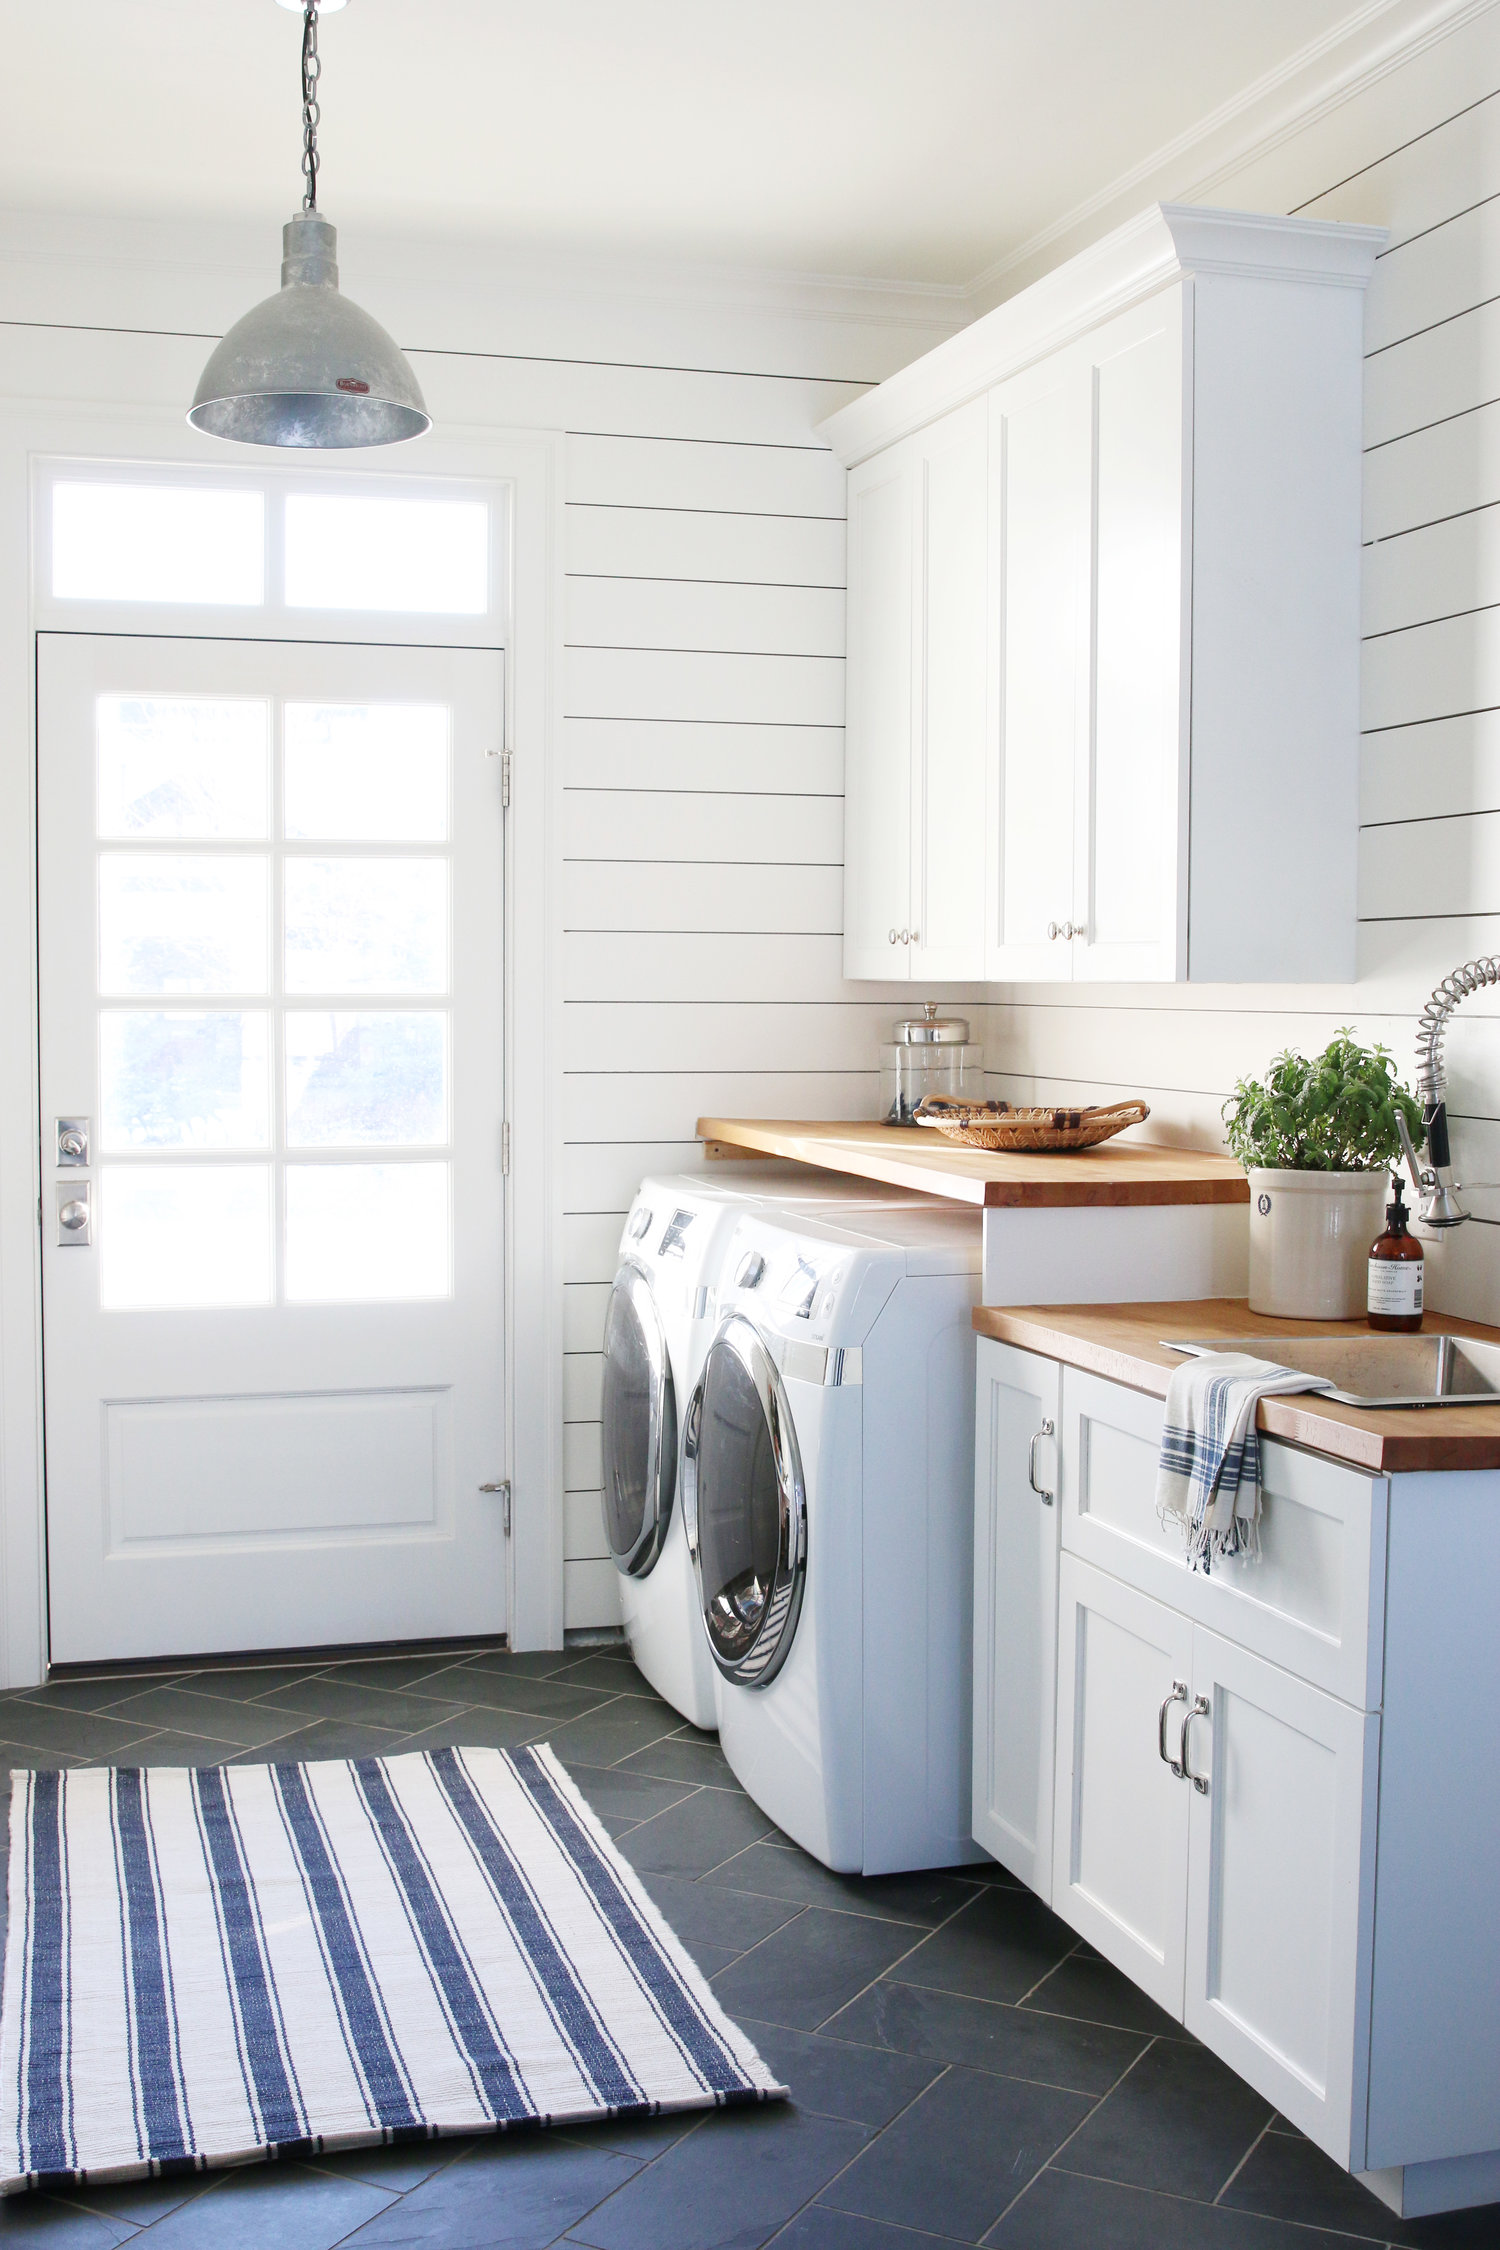 Get+the+Look_+Laundry+Room.jpg